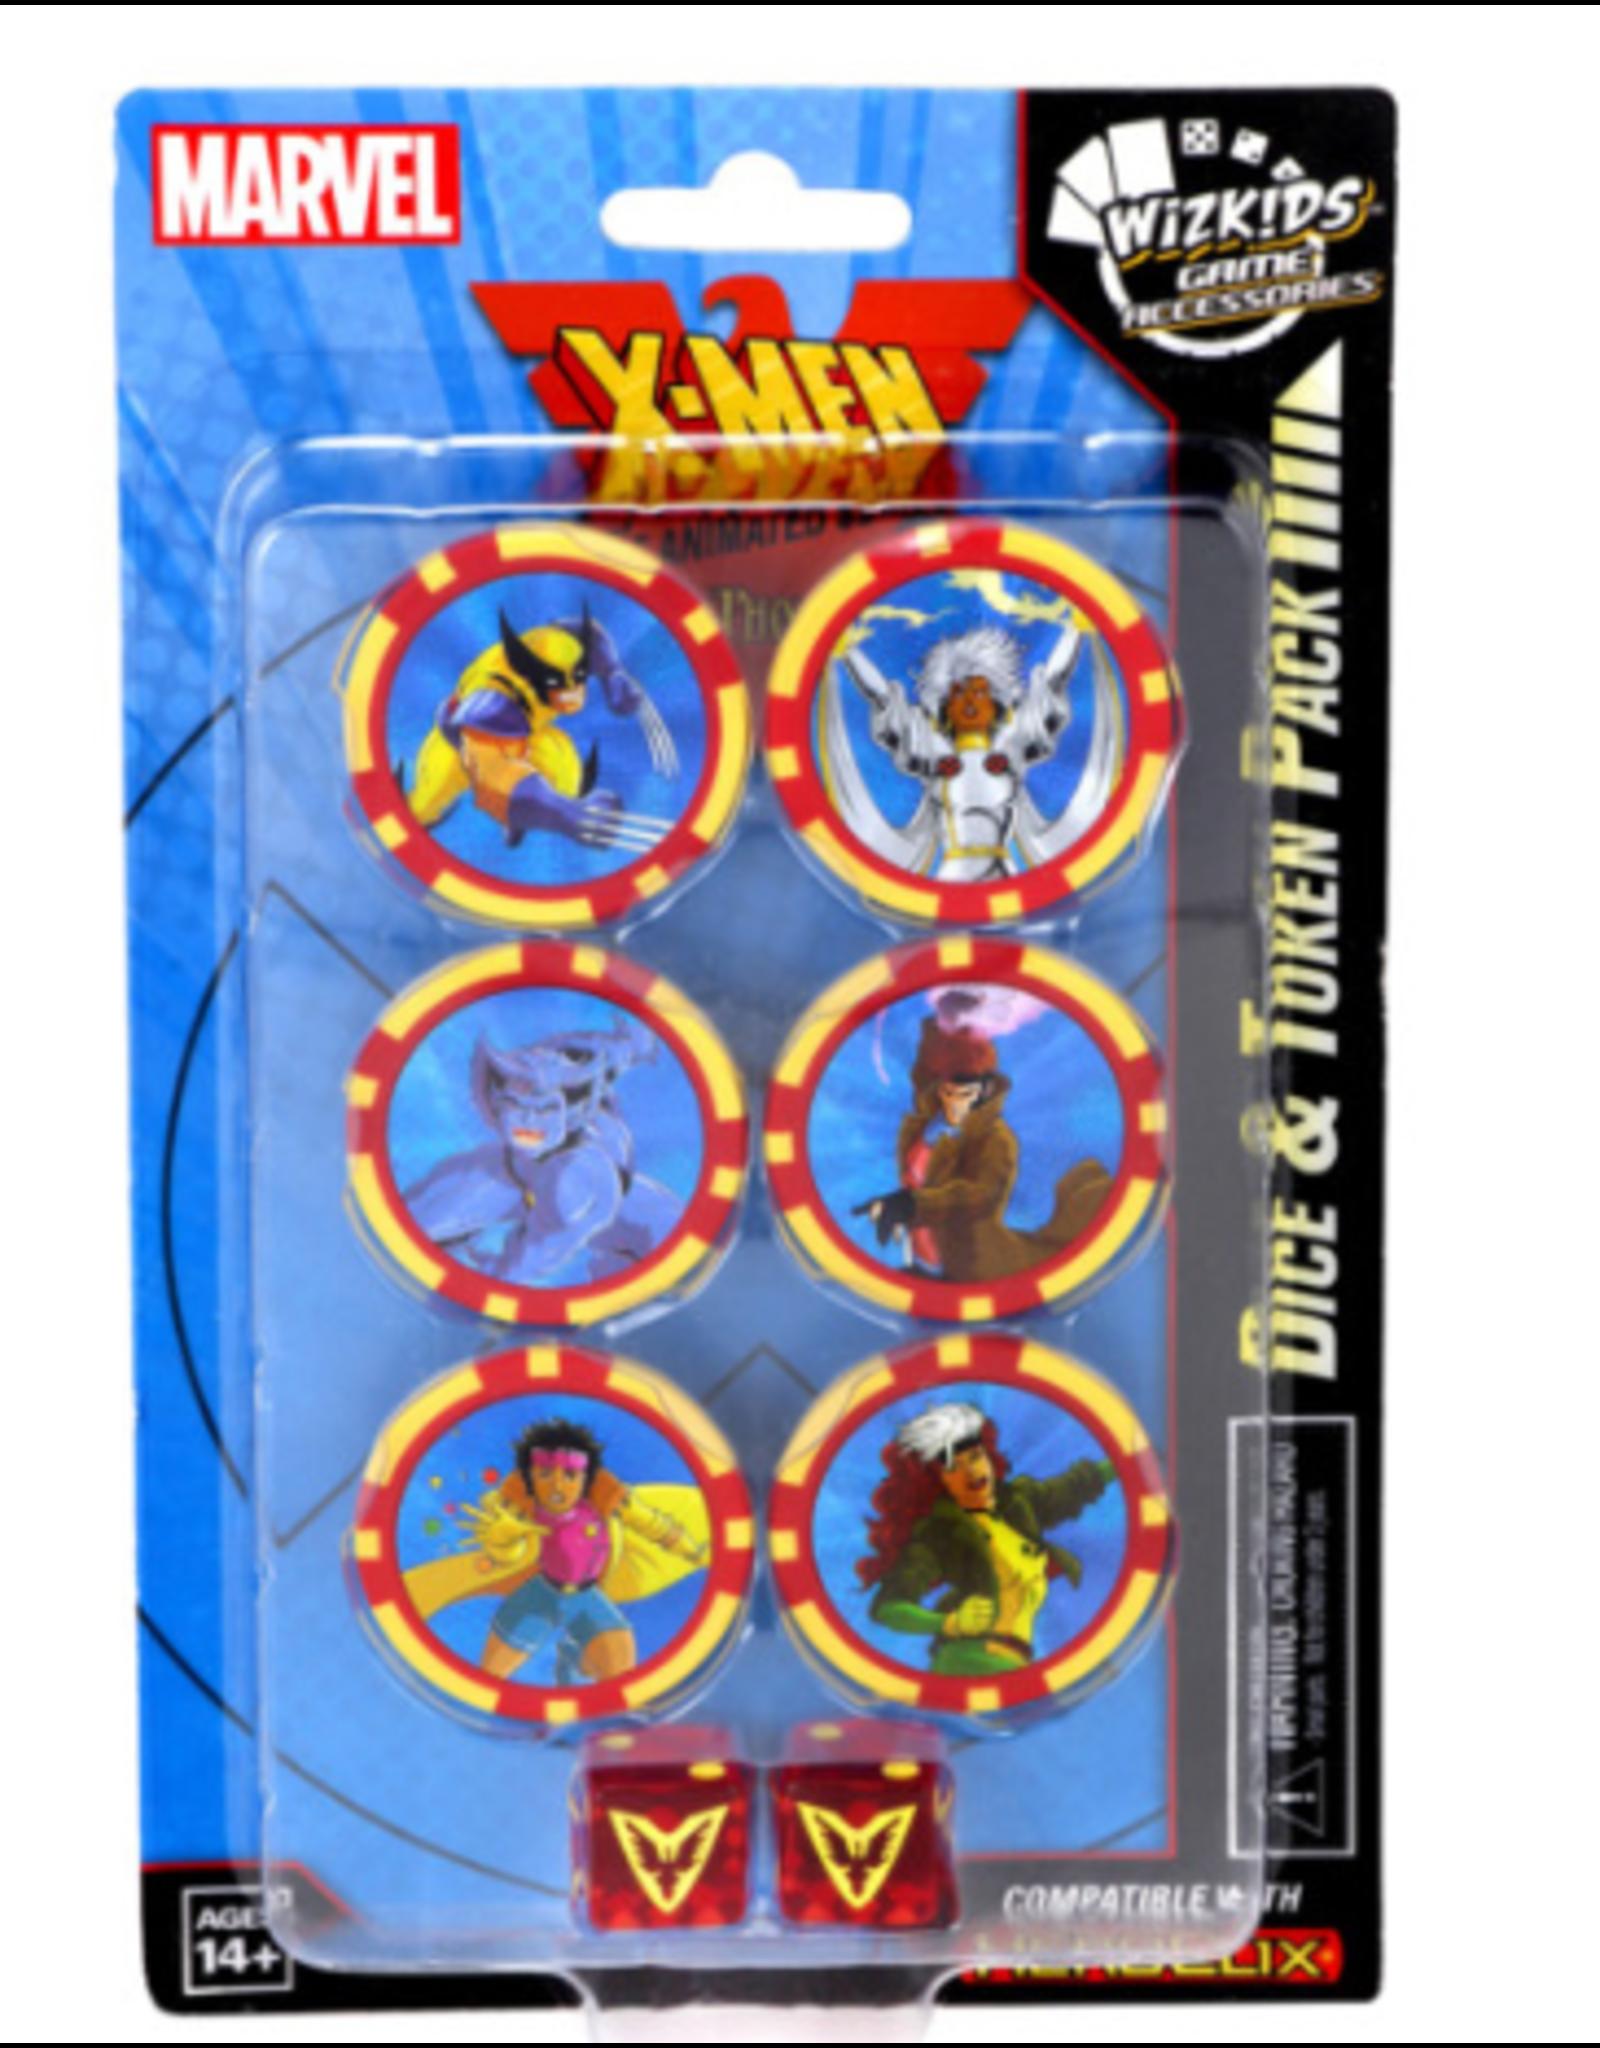 Wizkids Marvel HeroClix: X-Men the Animated Series Dark Phoenix Saga Dice and Token Pack